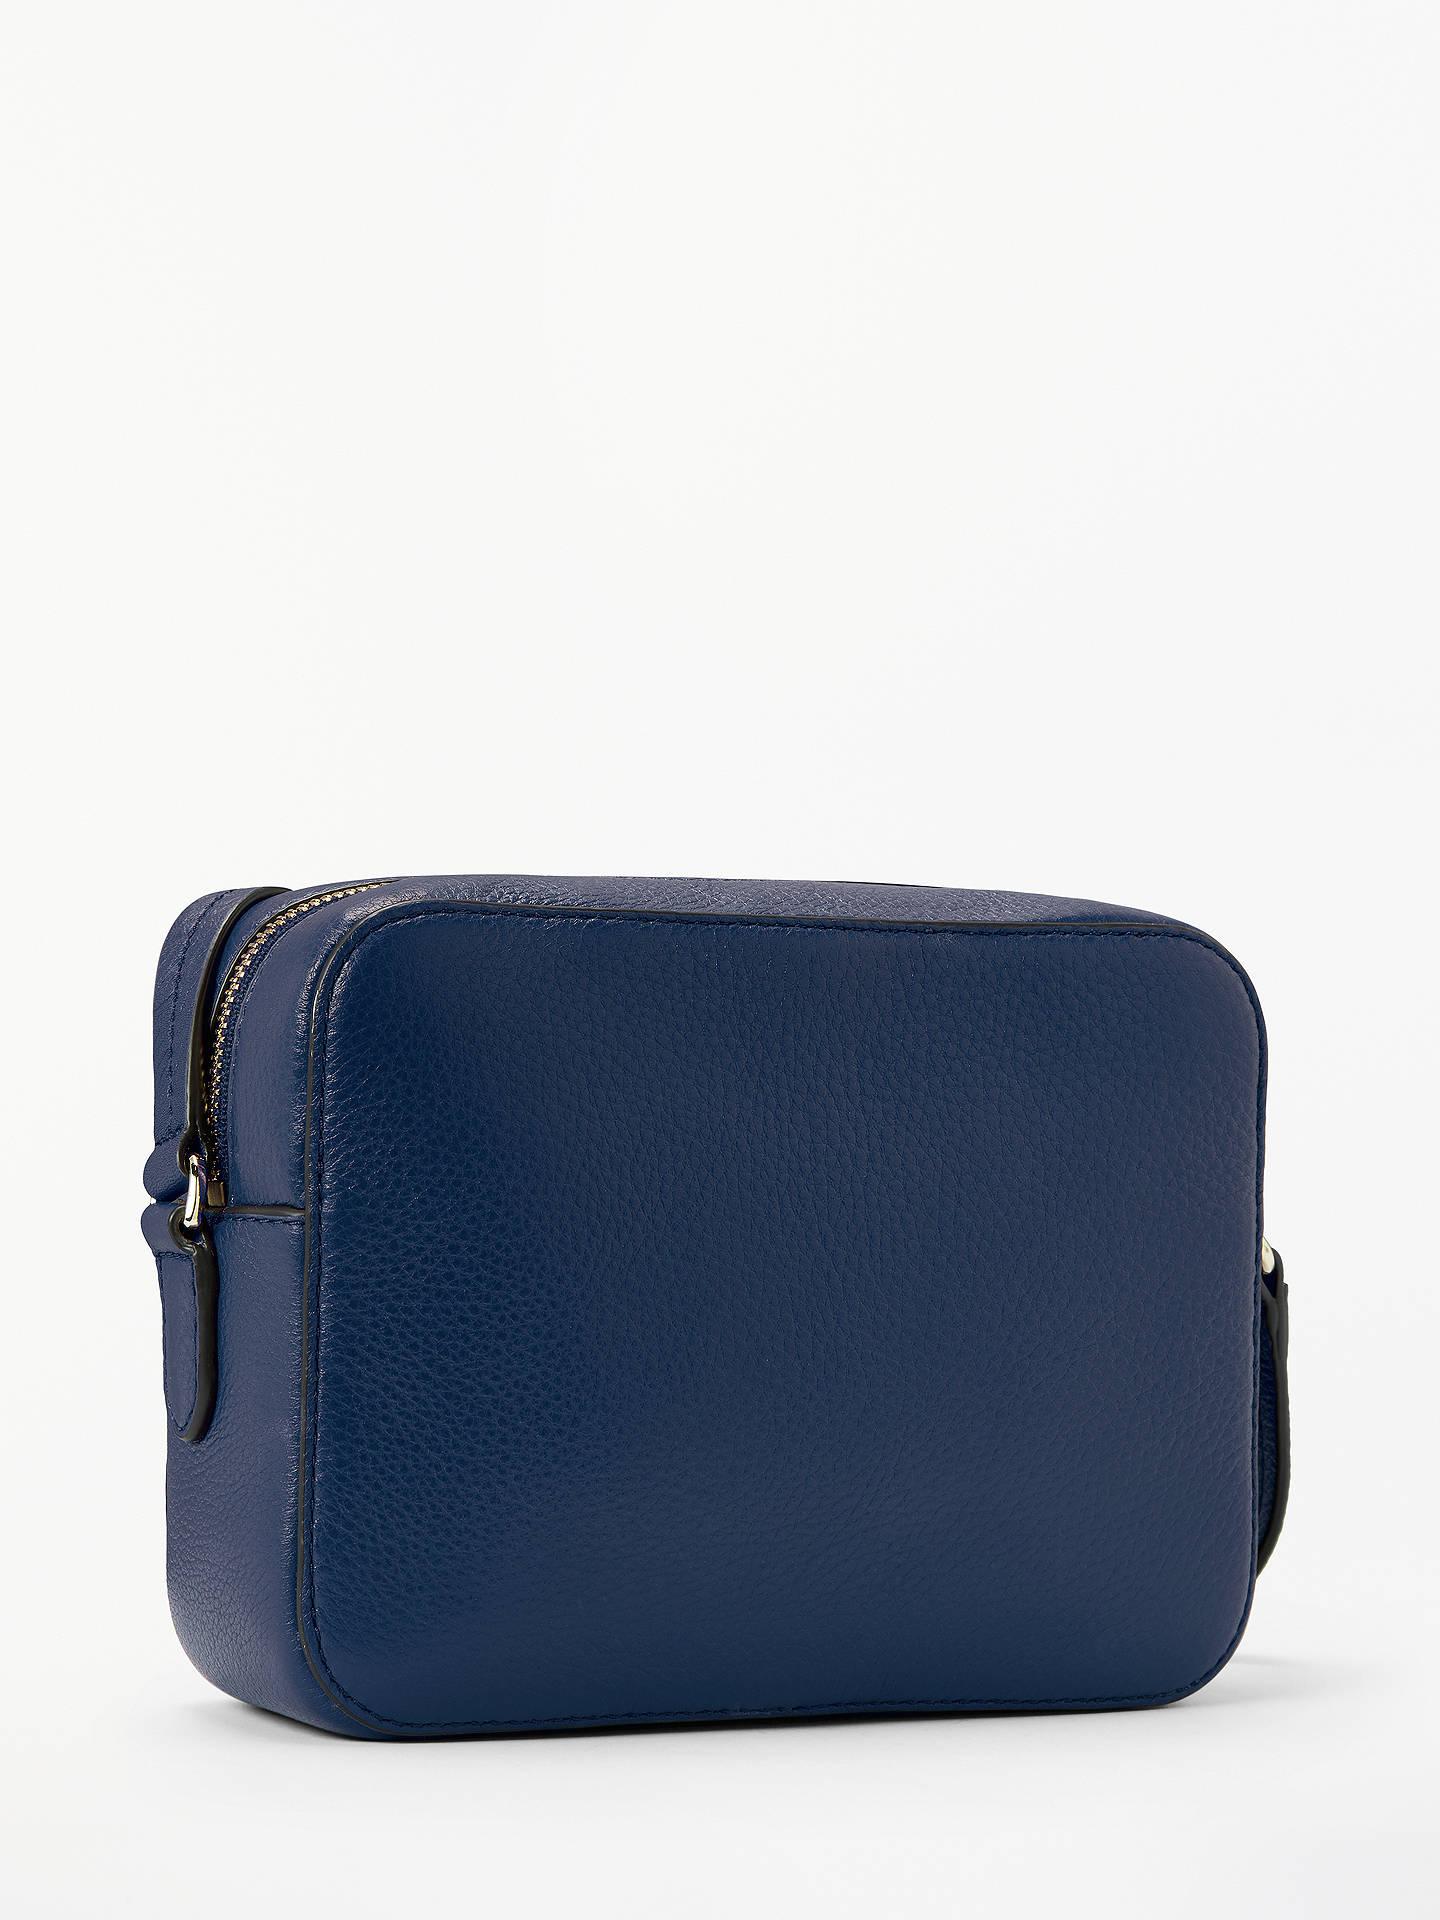 9ade0da68 ... Buy kate spade new york Hayes Street Arla Leather Cross Body Bag,  Blazer Blue Online ...